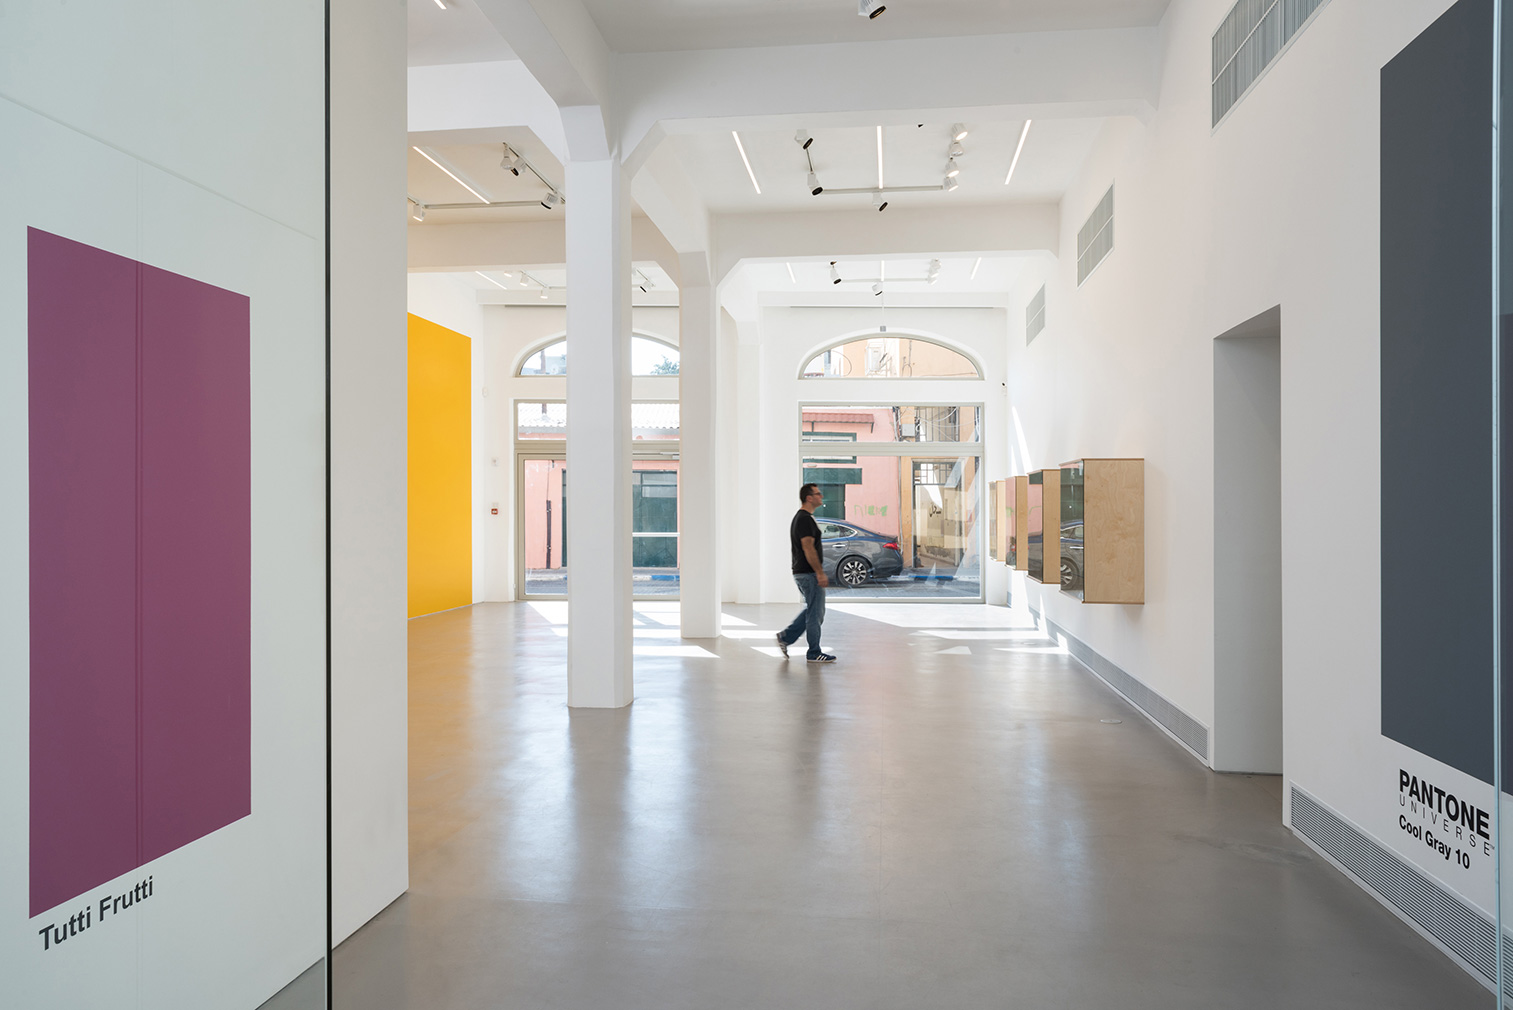 Magasin III gallery in Tel Aviv-Jaffa